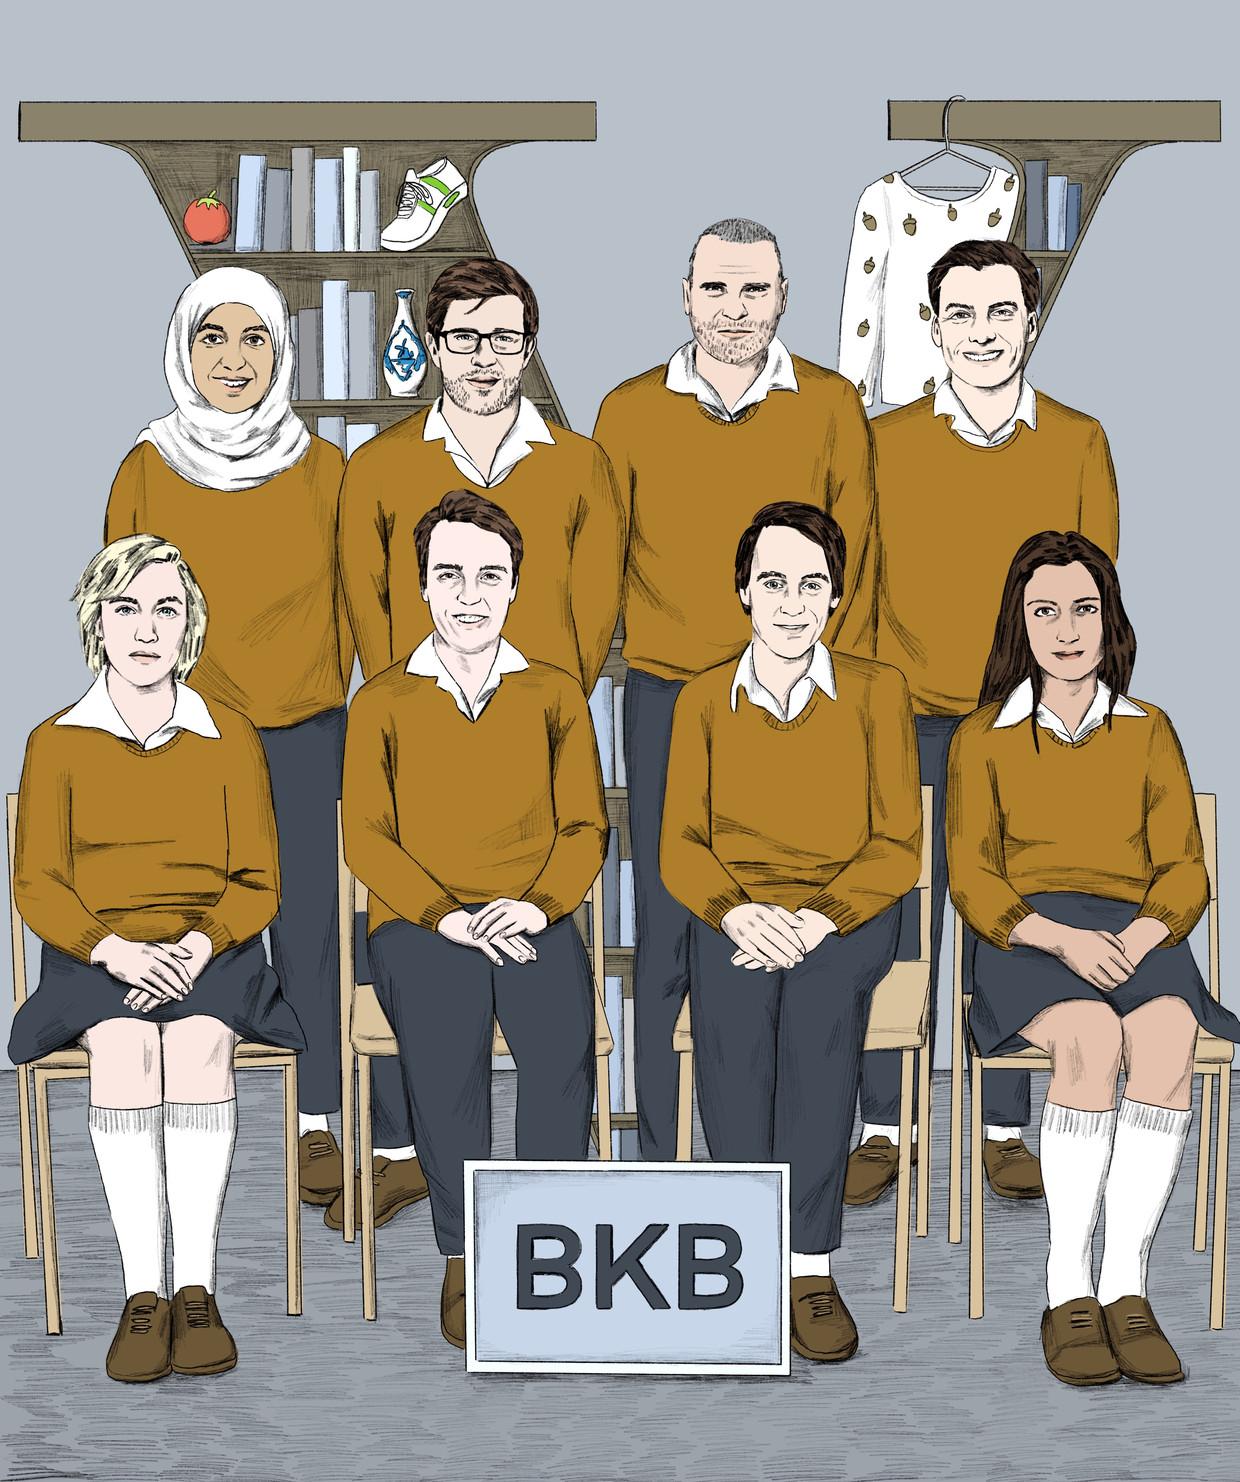 Alumni van de BKB Academie, bovenste rij vanaf links: Kauthar Bouchallikht, Toine Donk, Alex Klusman, Thierry Baudet.  Onderste rij vanaf links: Charlotte Bouwman, Sywert van Lienden, Alexander Klöpping, Shermin Chavoushi.  Beeld Jip van den Toorn